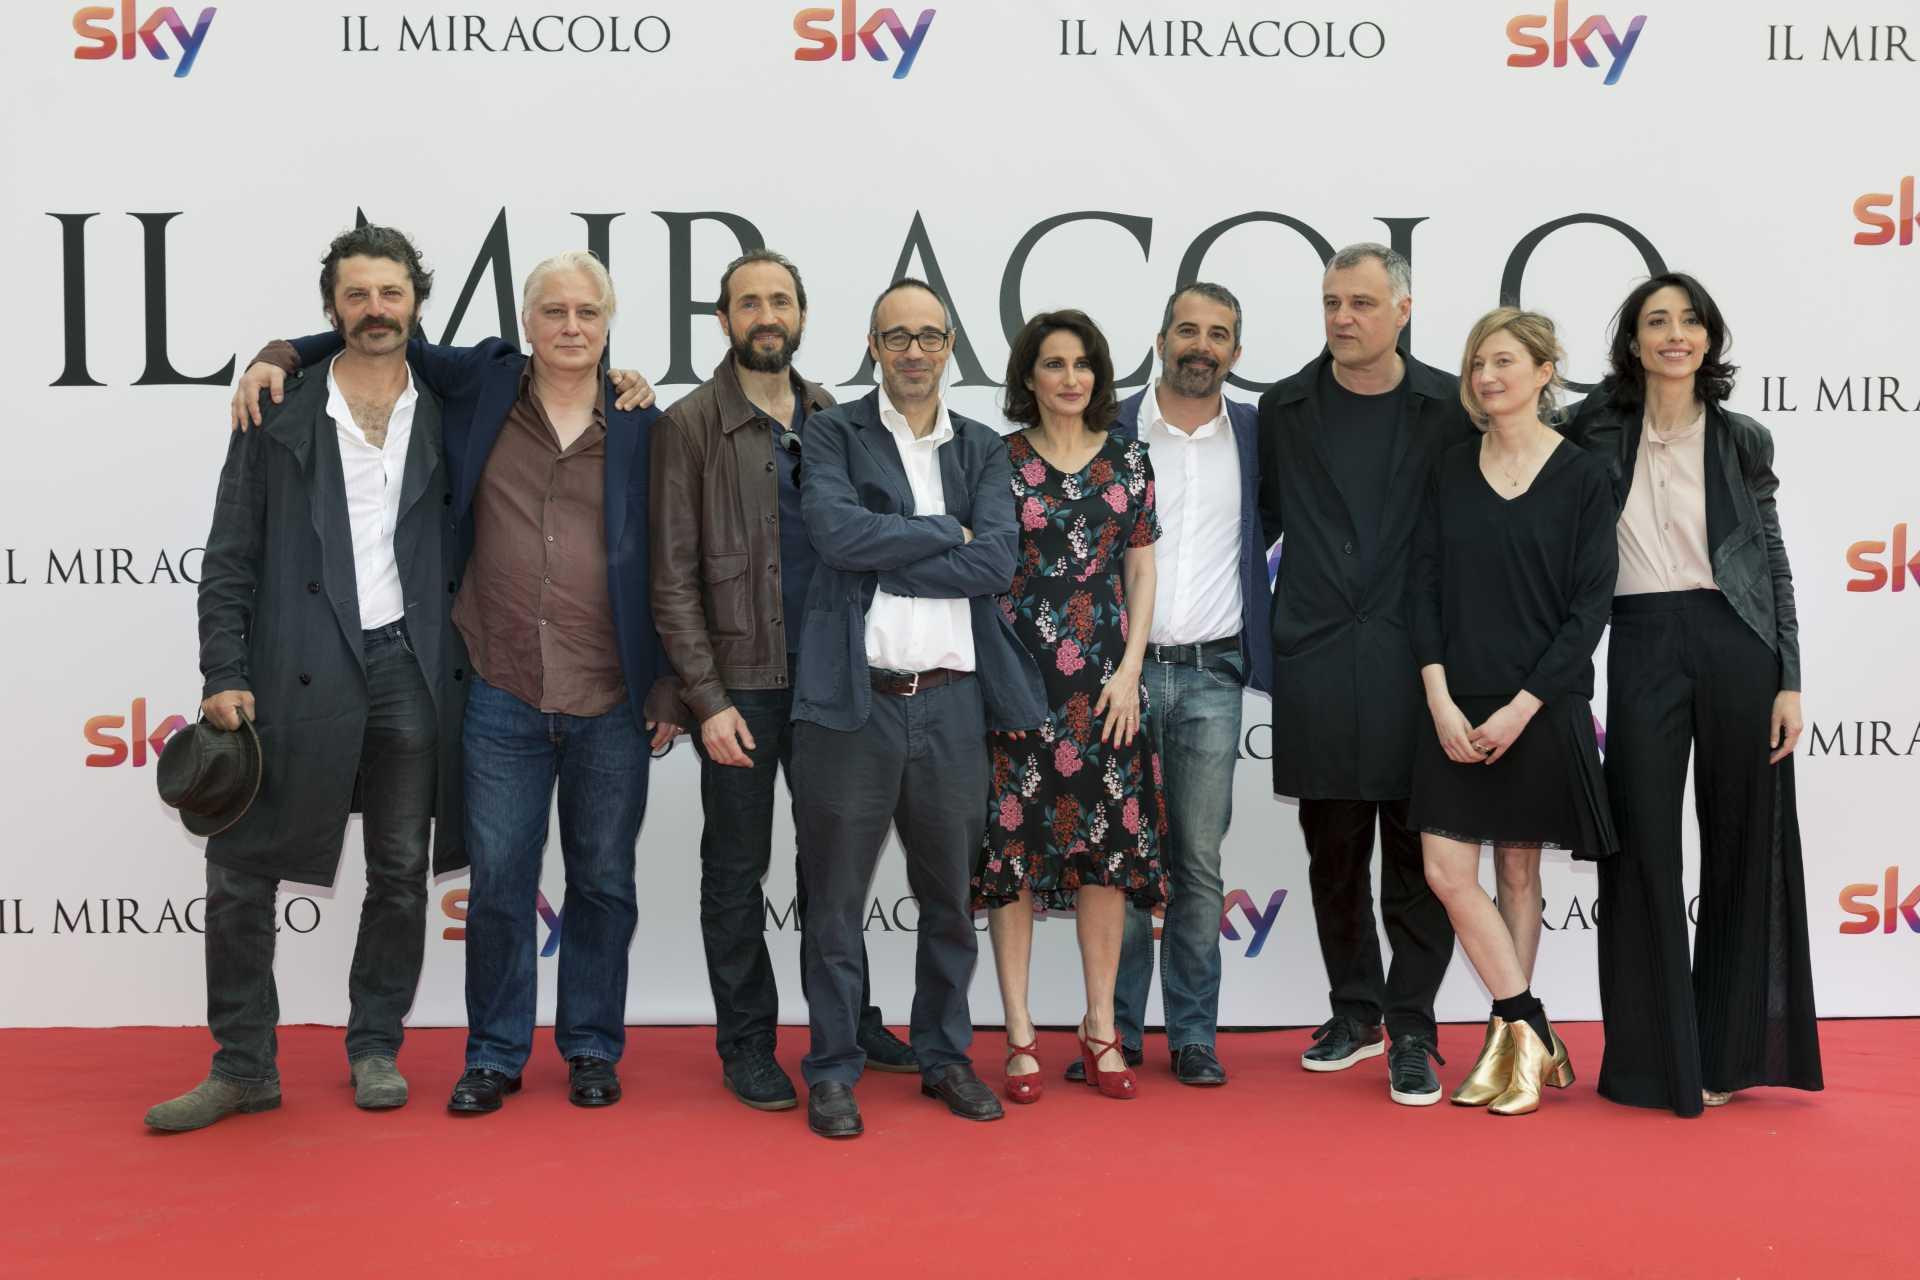 Europa League, Lione - Atalanta: orari diretta tv e canale